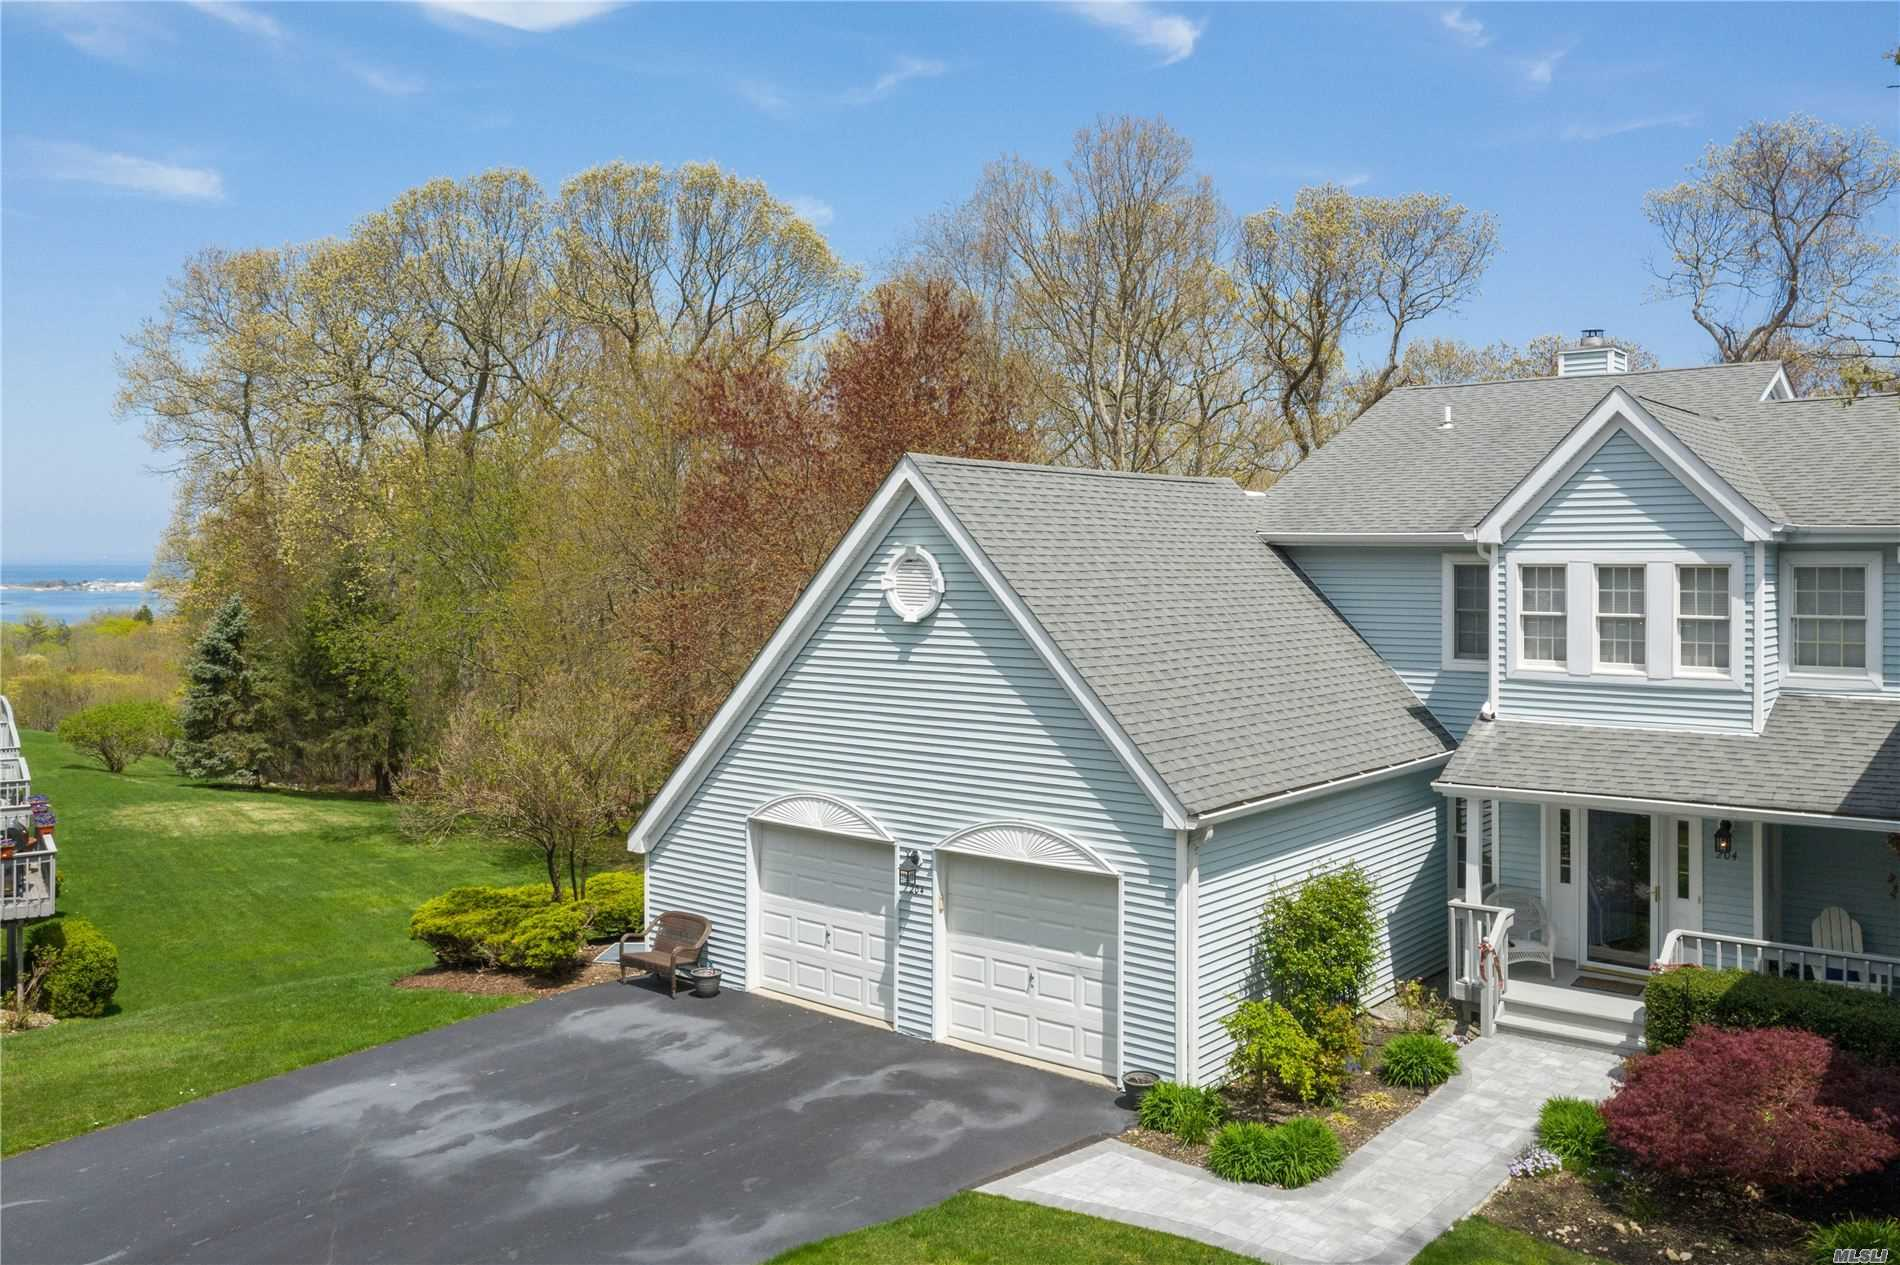 Property for sale at 204 Mountain Ridge Drive, Mt. Sinai NY 11766, Mt. Sinai,  New York 11766